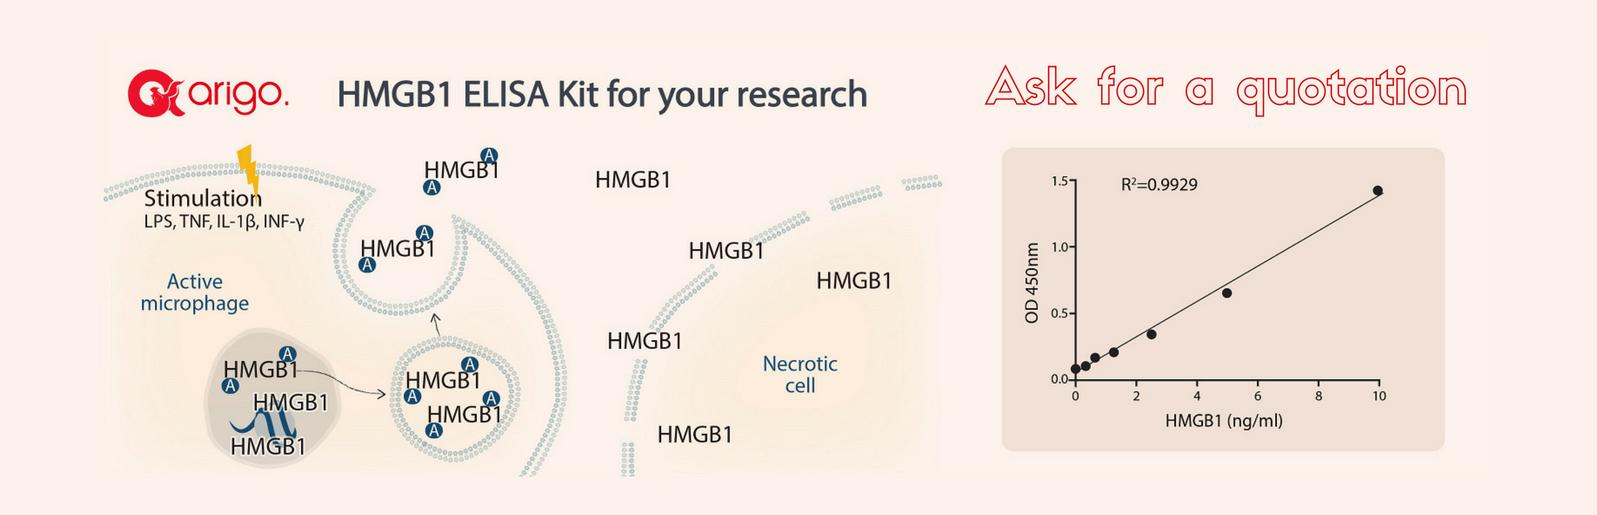 macrophages, monocytes and dendritic cells, célula dendrítica, macrófagos, immune cells, inmune, sistema, chromatin protein, cromatina, HMGB1, ELISA, human, amphoterin